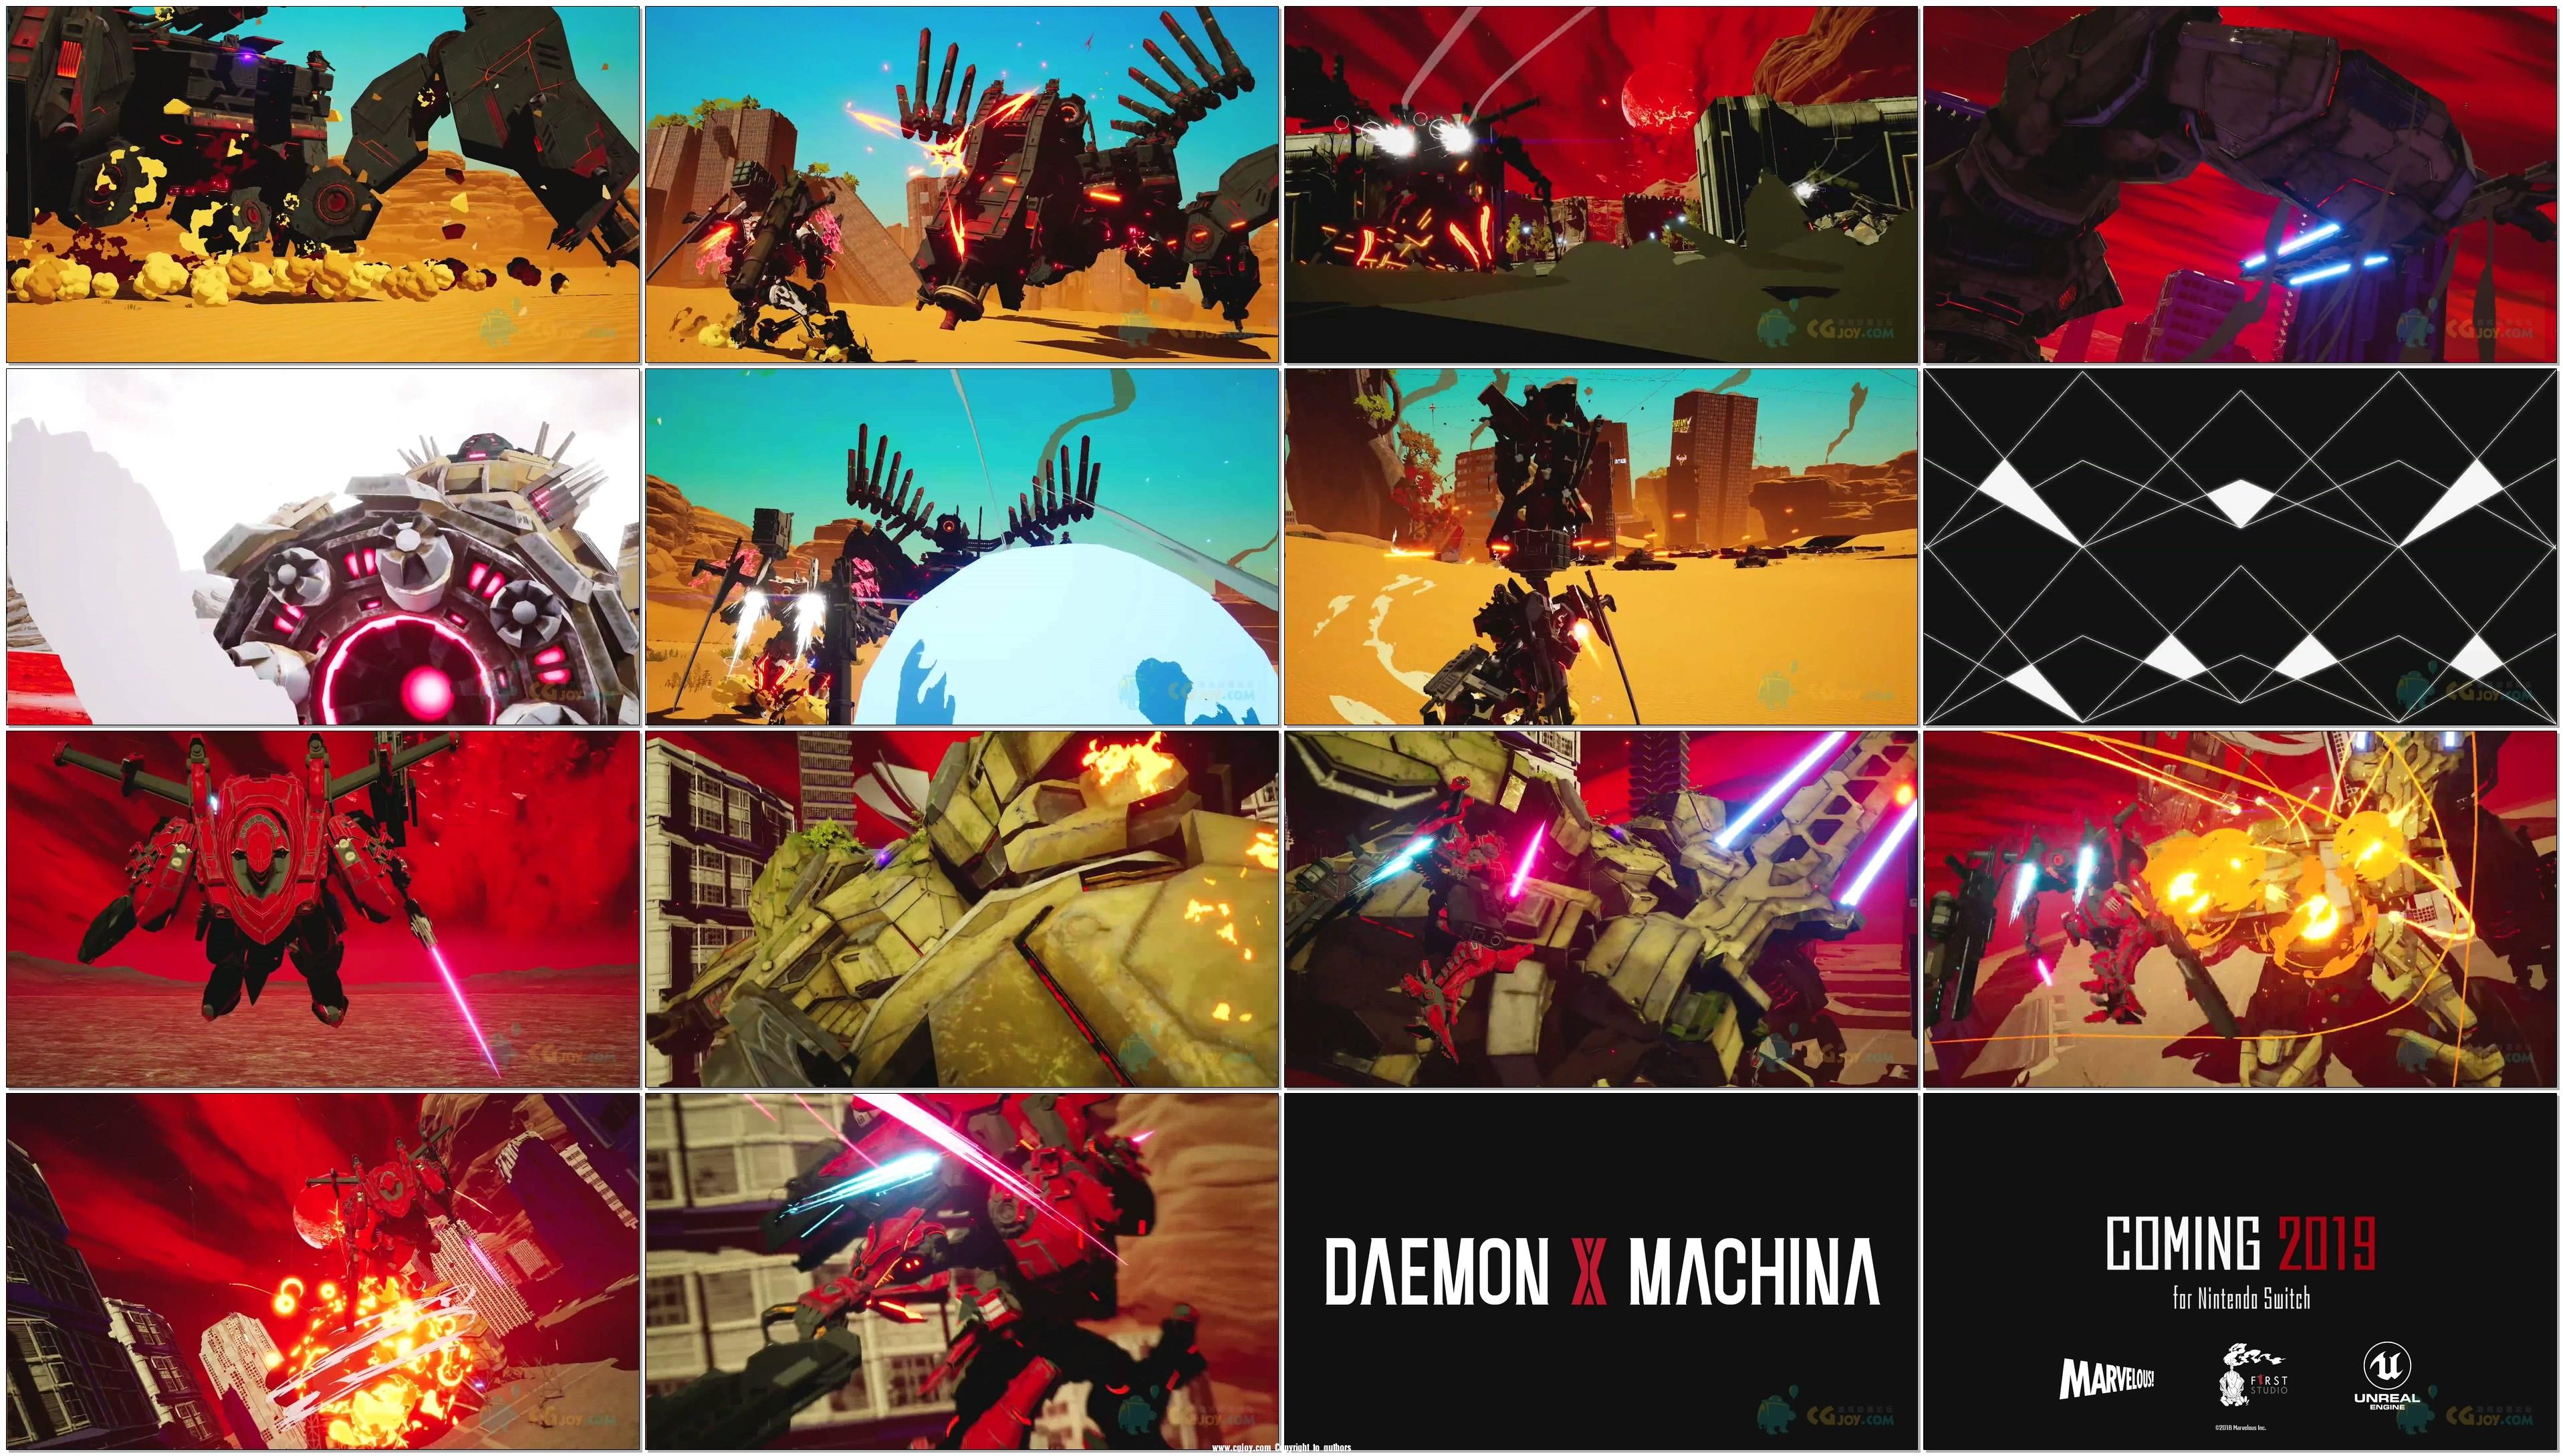 E3 Play2018-任天堂公布机甲动作新游 DAEMON X MACHINA - 预告片.mp4.jpg